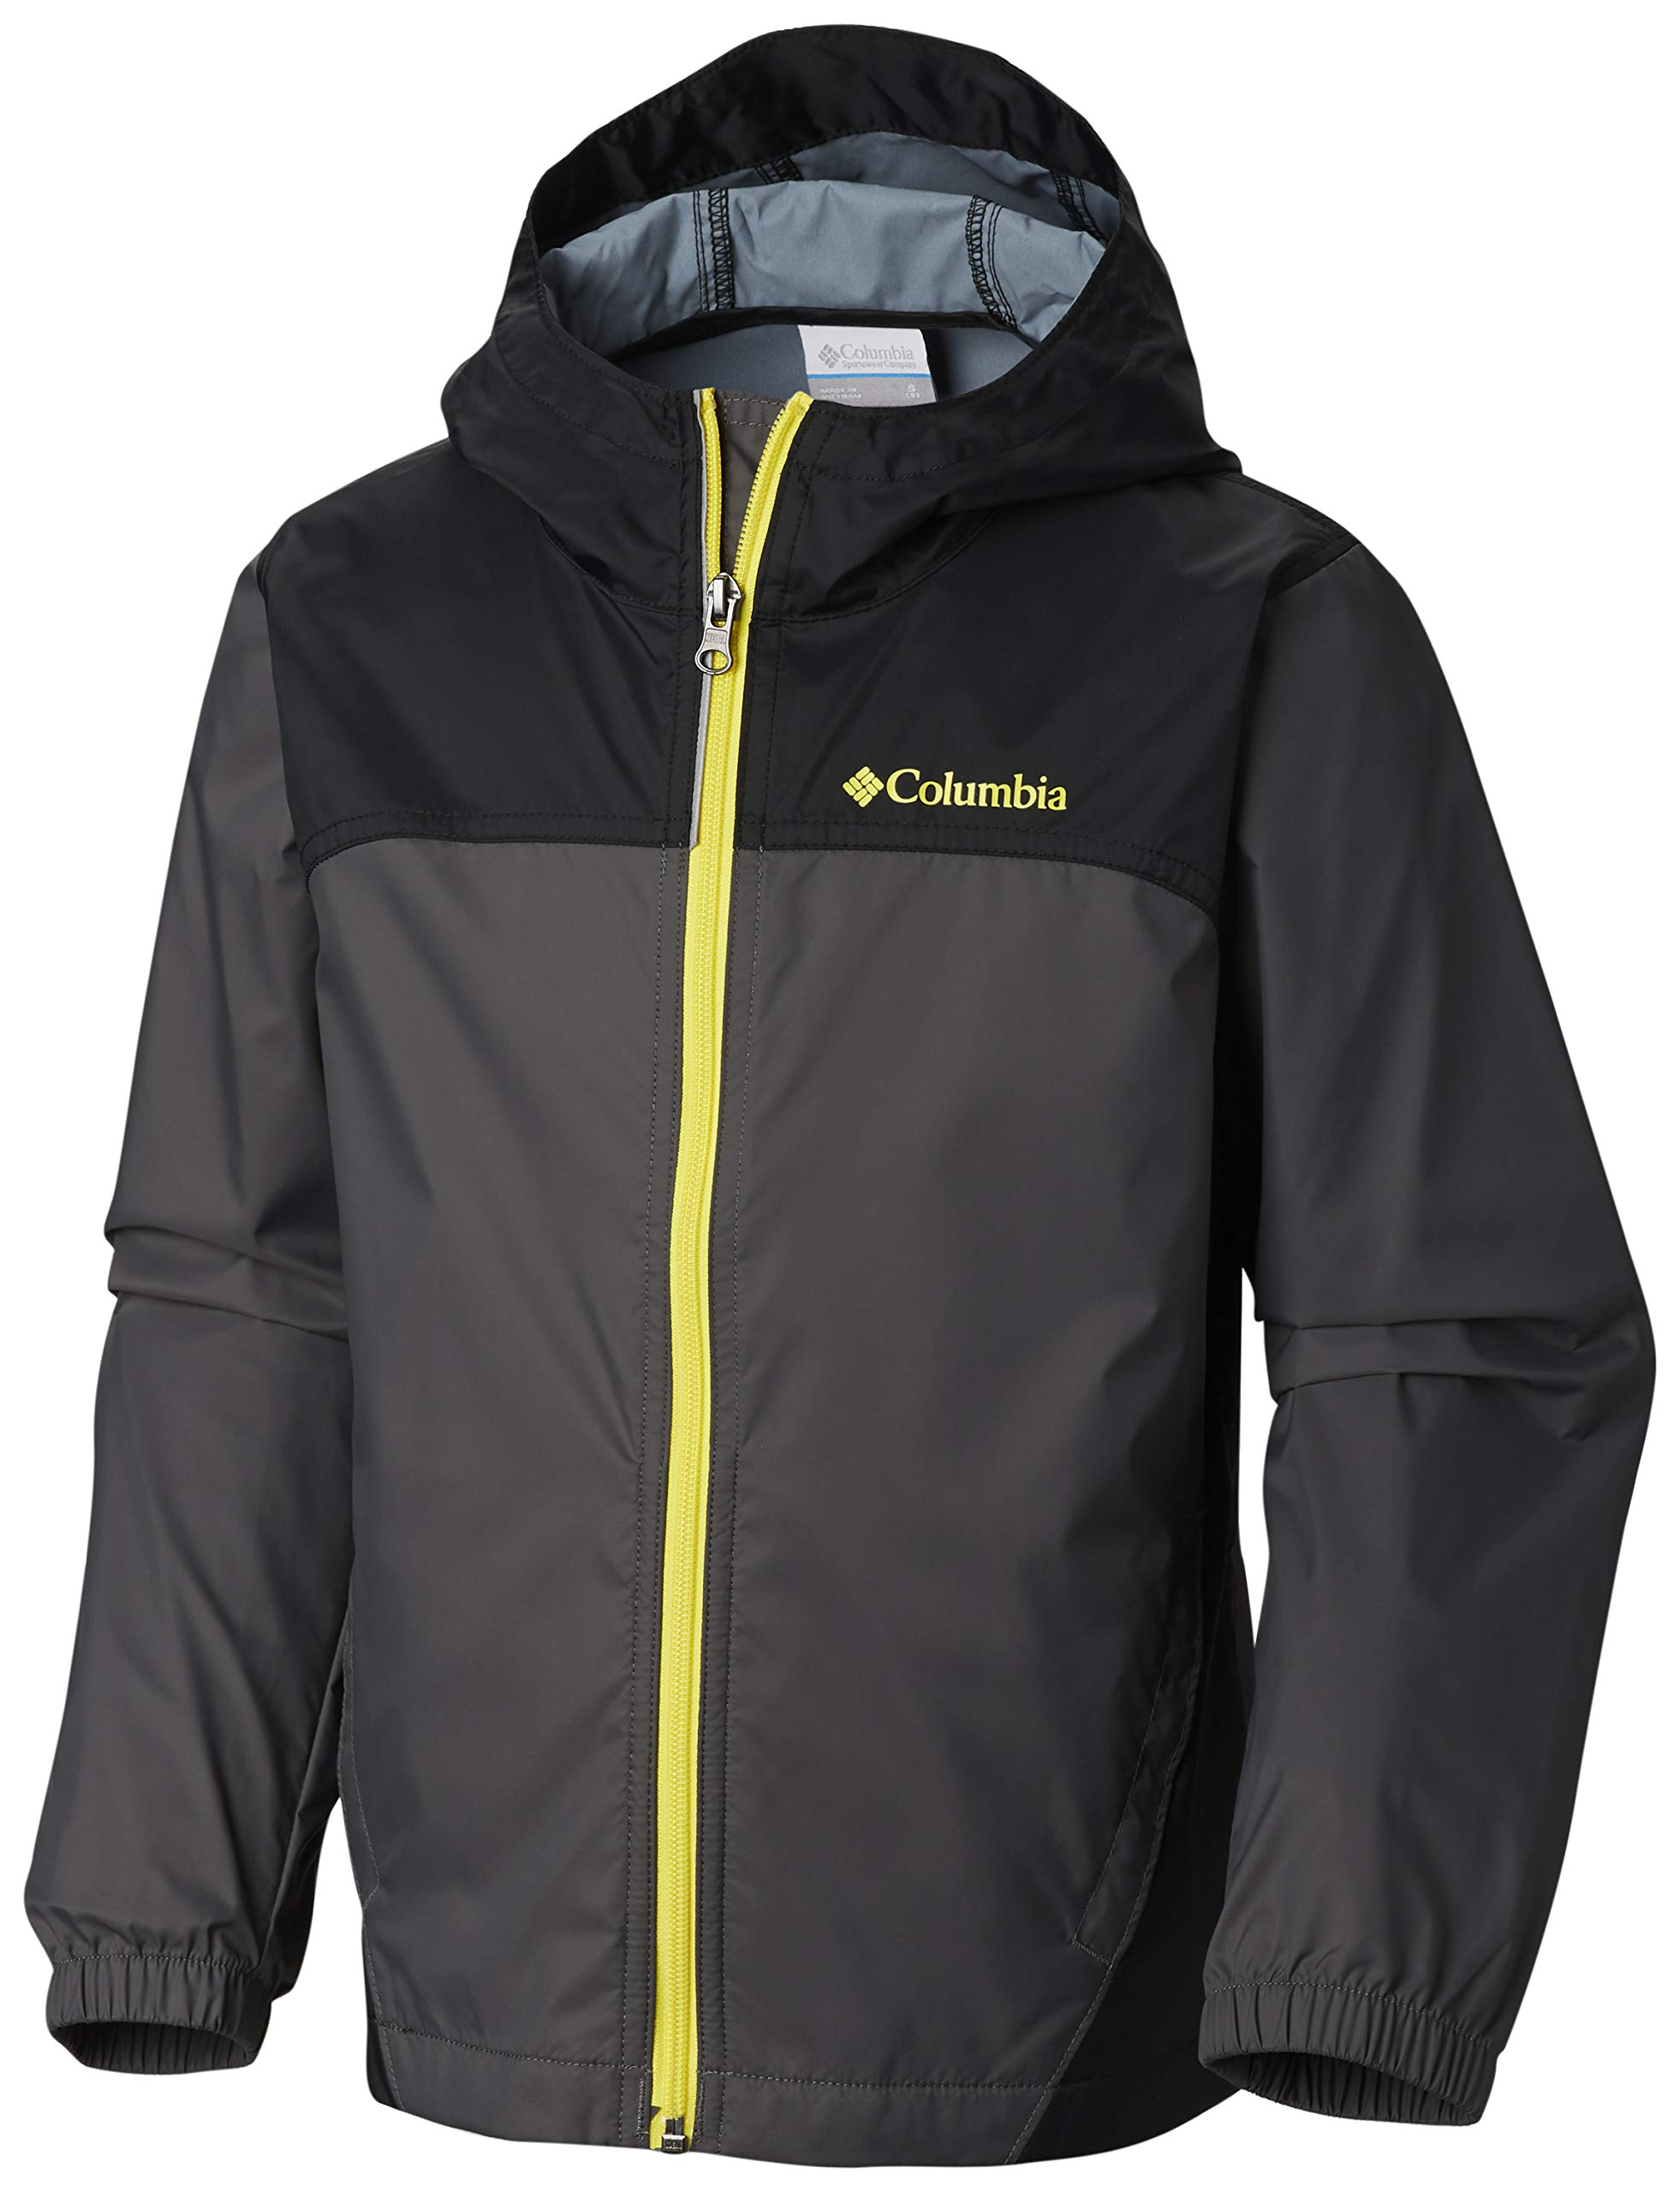 Columbia Boys' Little Glennaker Rain Jacket, Grill/Black X-Small by Columbia (Image #1)